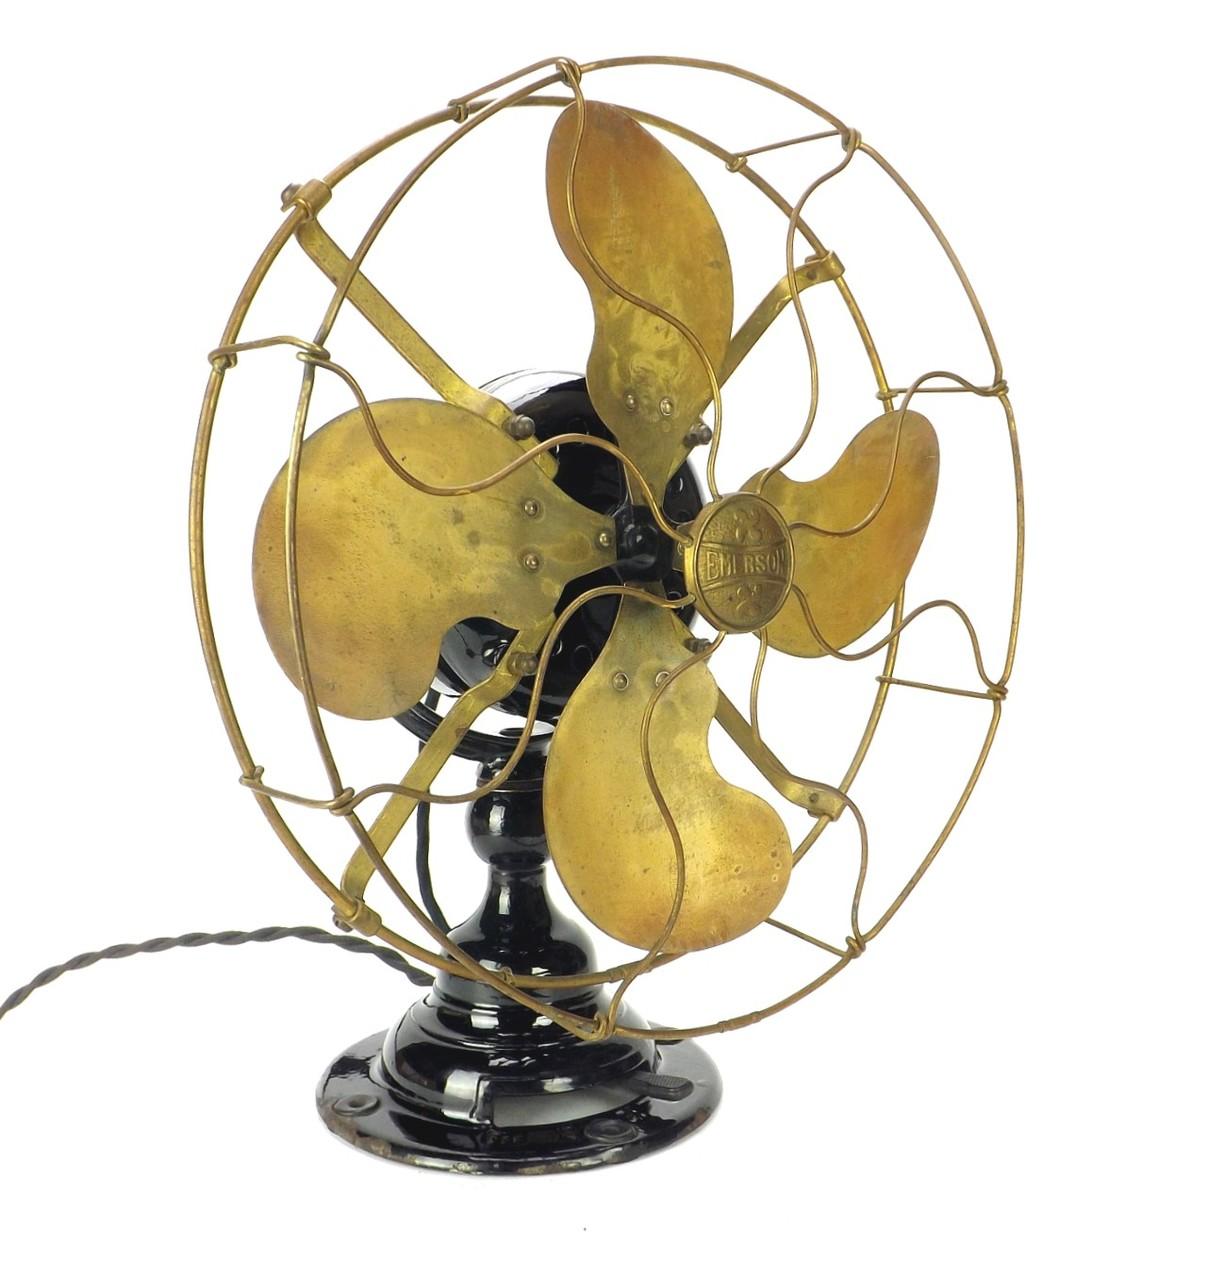 "Circa 1911 12"" Emerson Type 14646 Stationary Desk Fan"